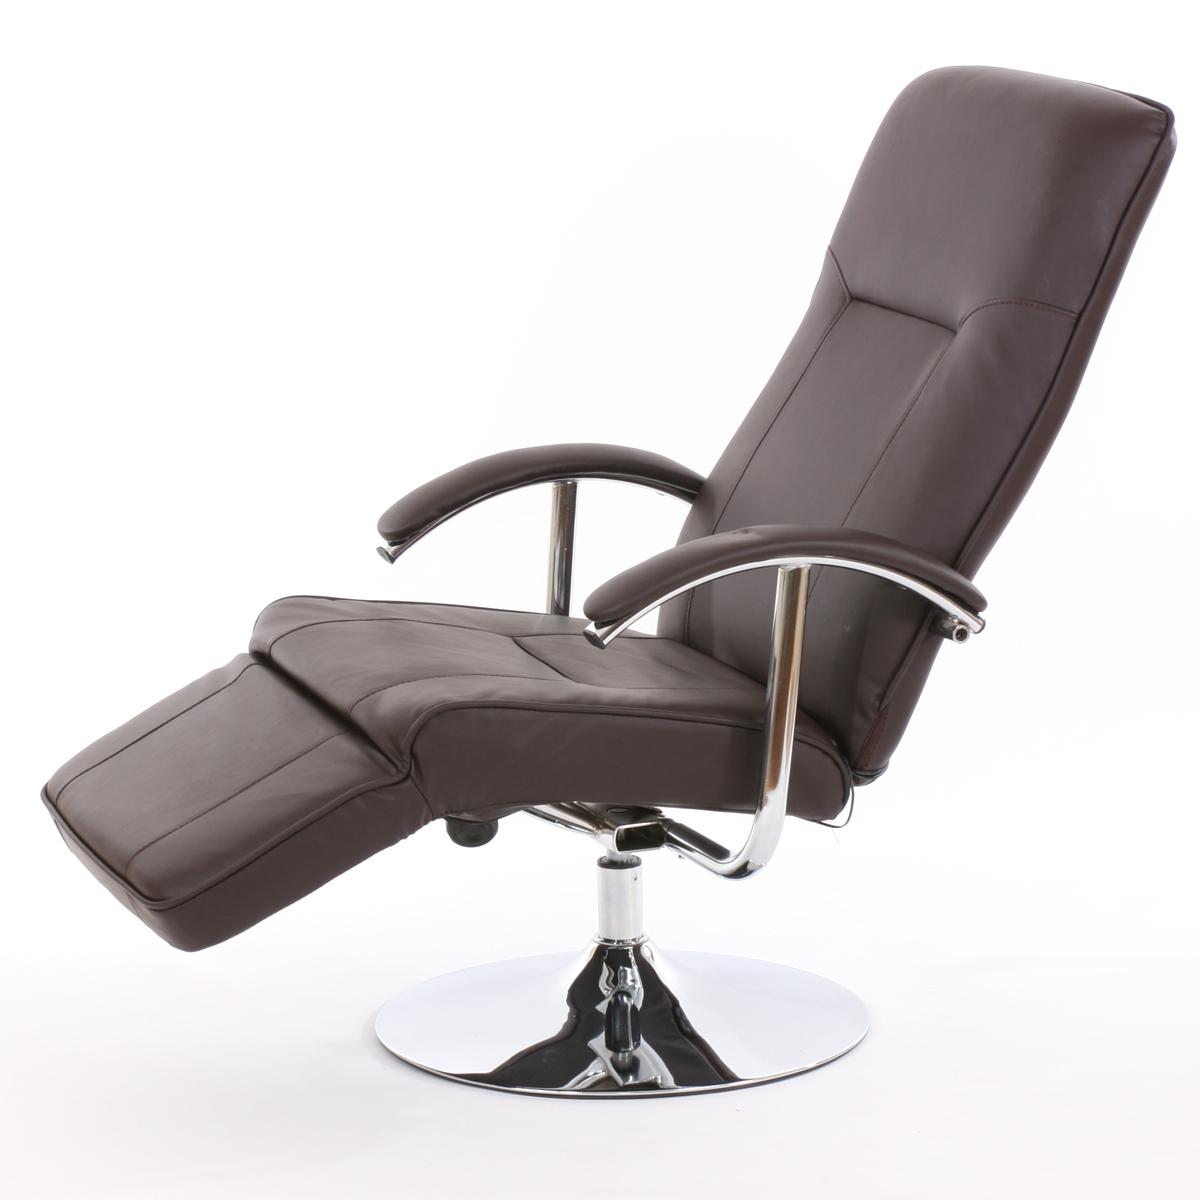 relaxliege relaxsessel ascoli ii braun leder. Black Bedroom Furniture Sets. Home Design Ideas